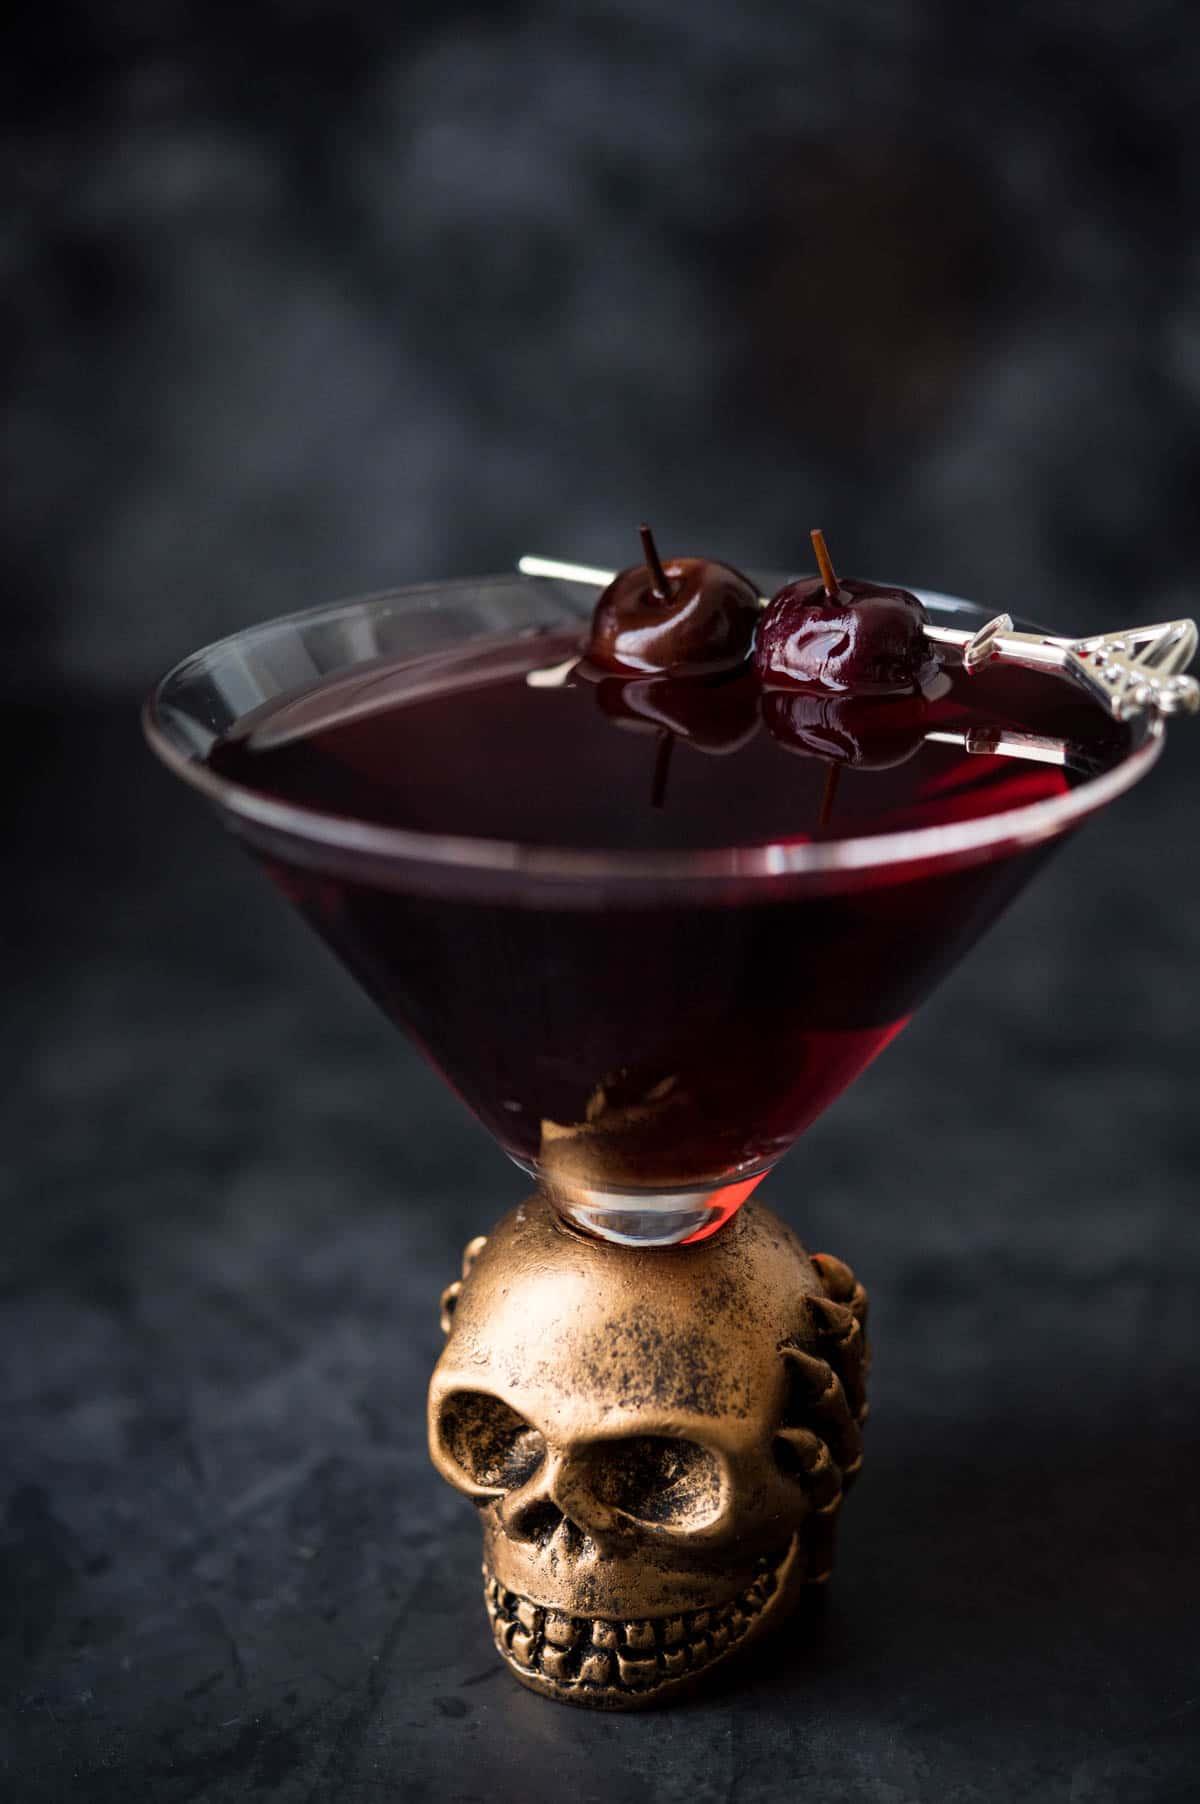 spooky halloween drunken cherry martini in a skull glass.